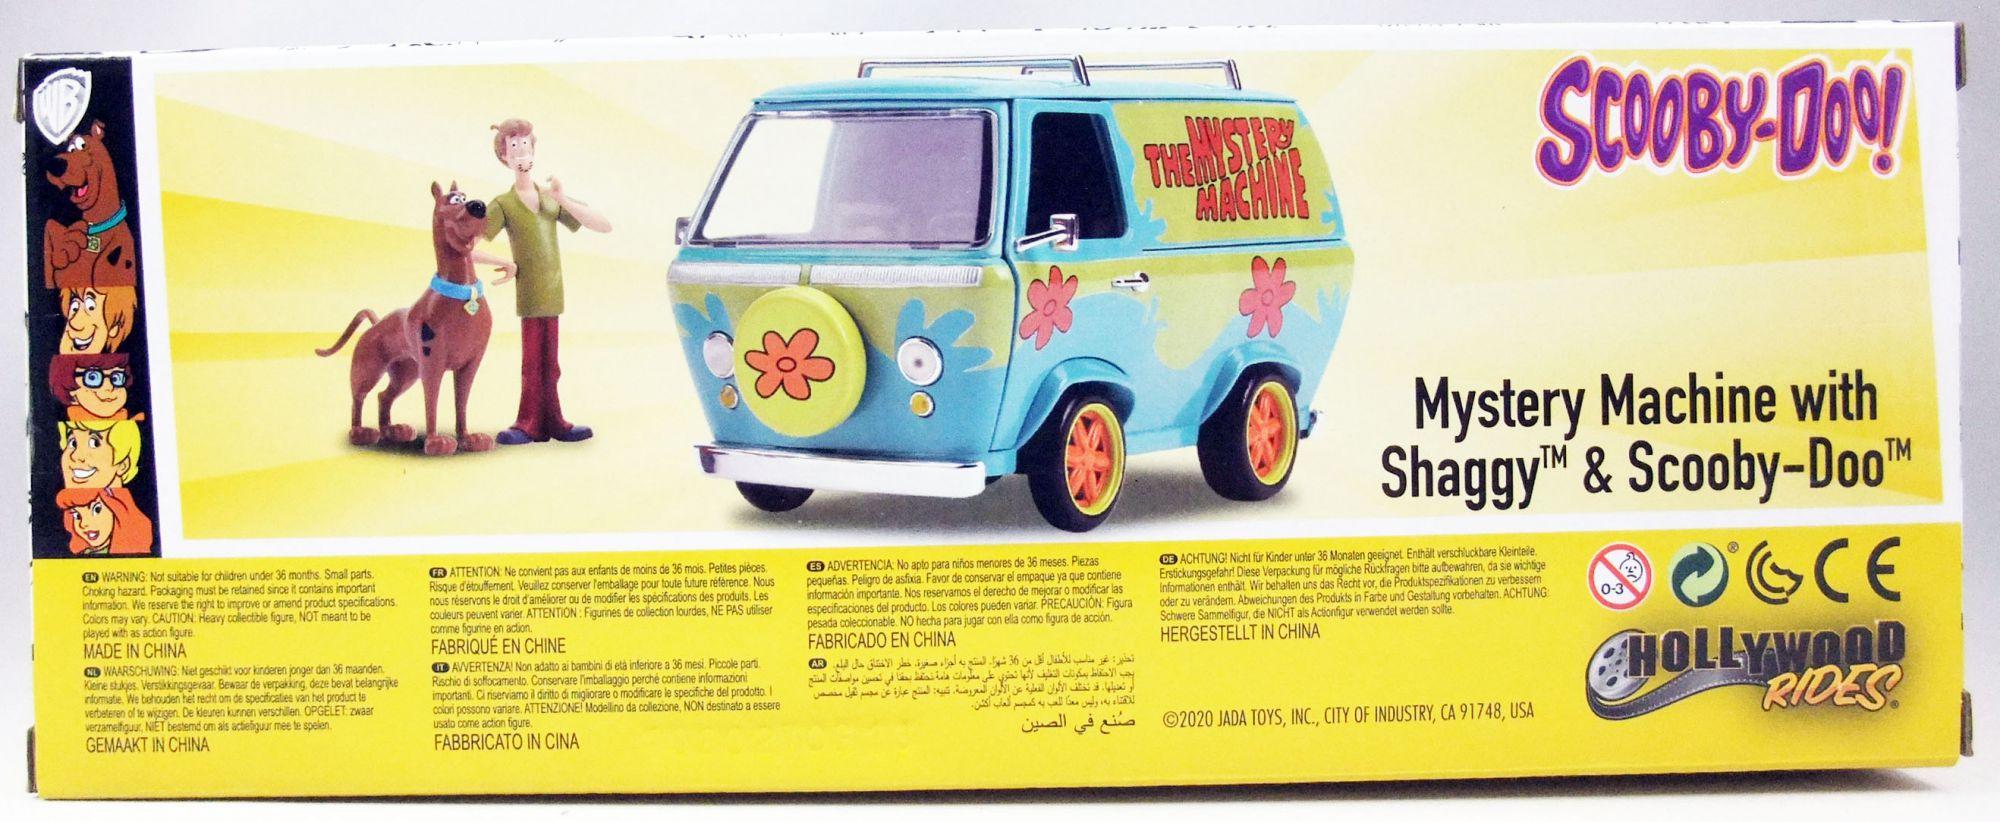 Scooby-Doo - Jada - 1:24 scale die-cast Mystery Machine with Shaggy & Scooby-Doo